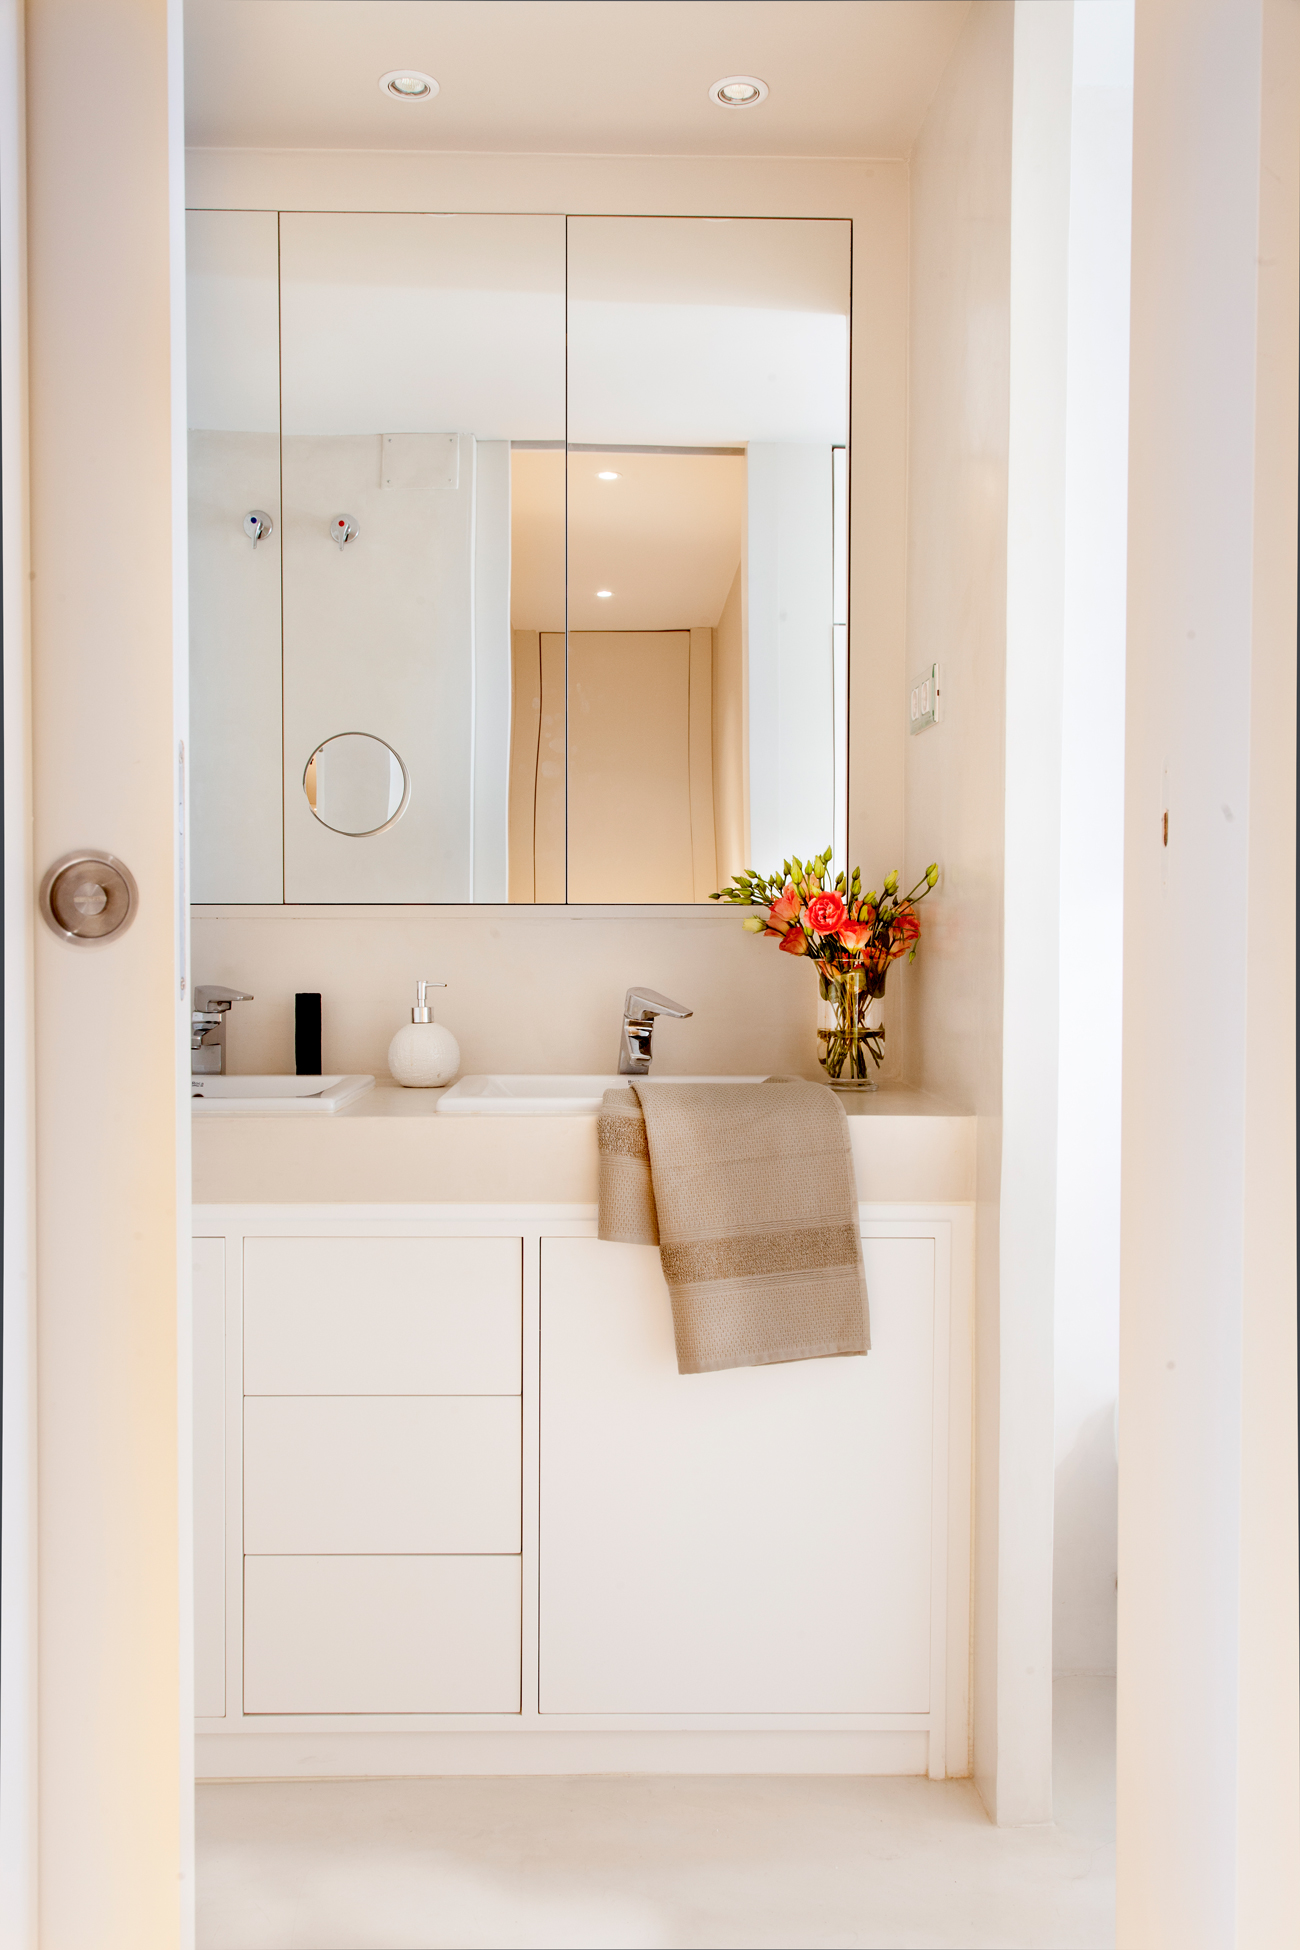 Mueble bajo lavabo pie cheap ikea esta lavabo da carcter al bao with mueble bajo lavabo pie - Armario bajo lavabo pie ...